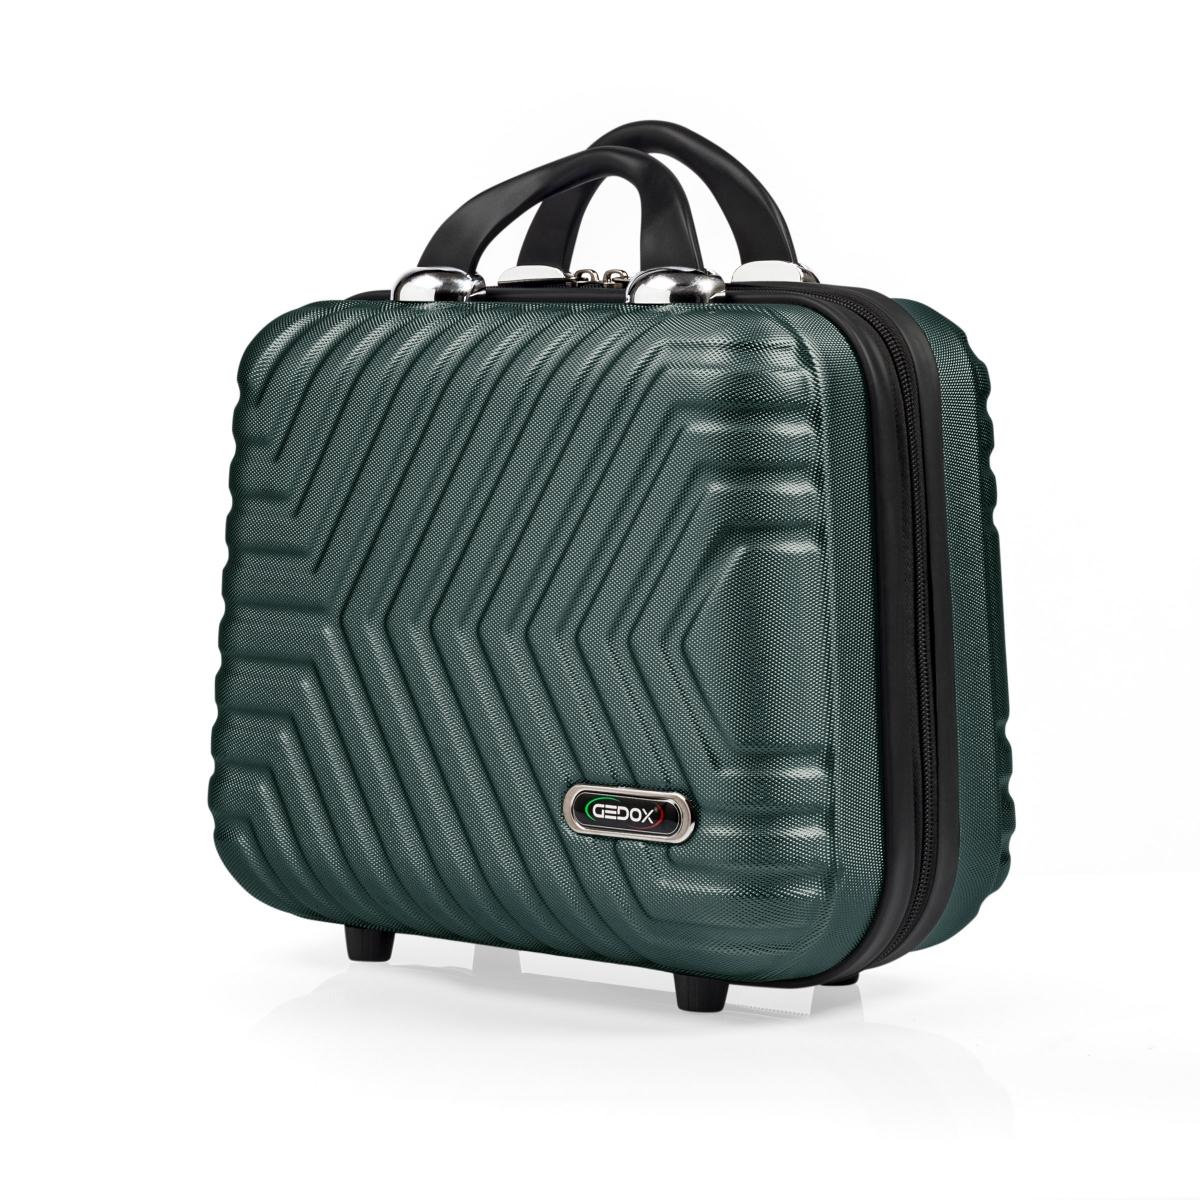 G&D Polo Suitcase Abs Makyaj&Hostes El Çantası Model:615.07 Haki Yeşil